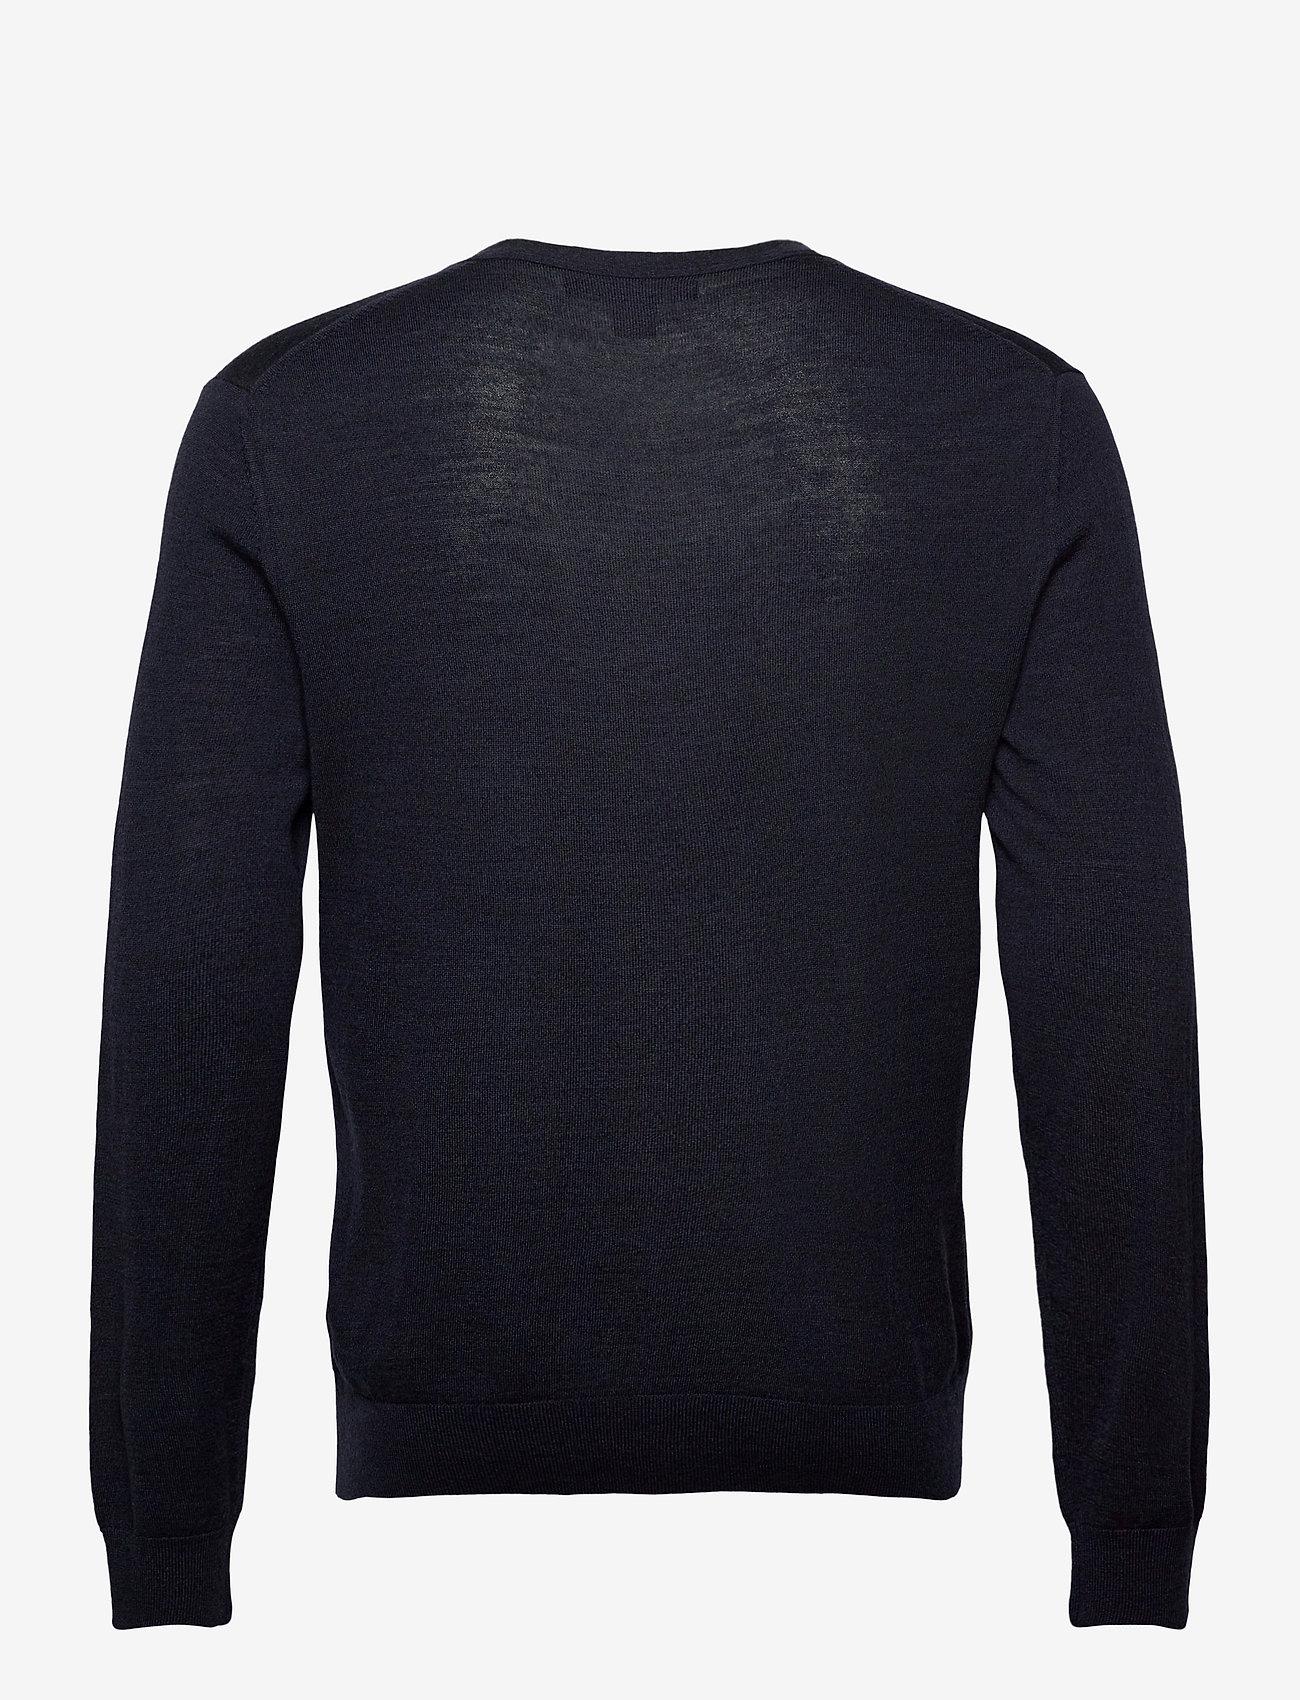 Banana Republic - Merino Cardigan Sweater in Responsible Wool - basic knitwear - navy heather - 1